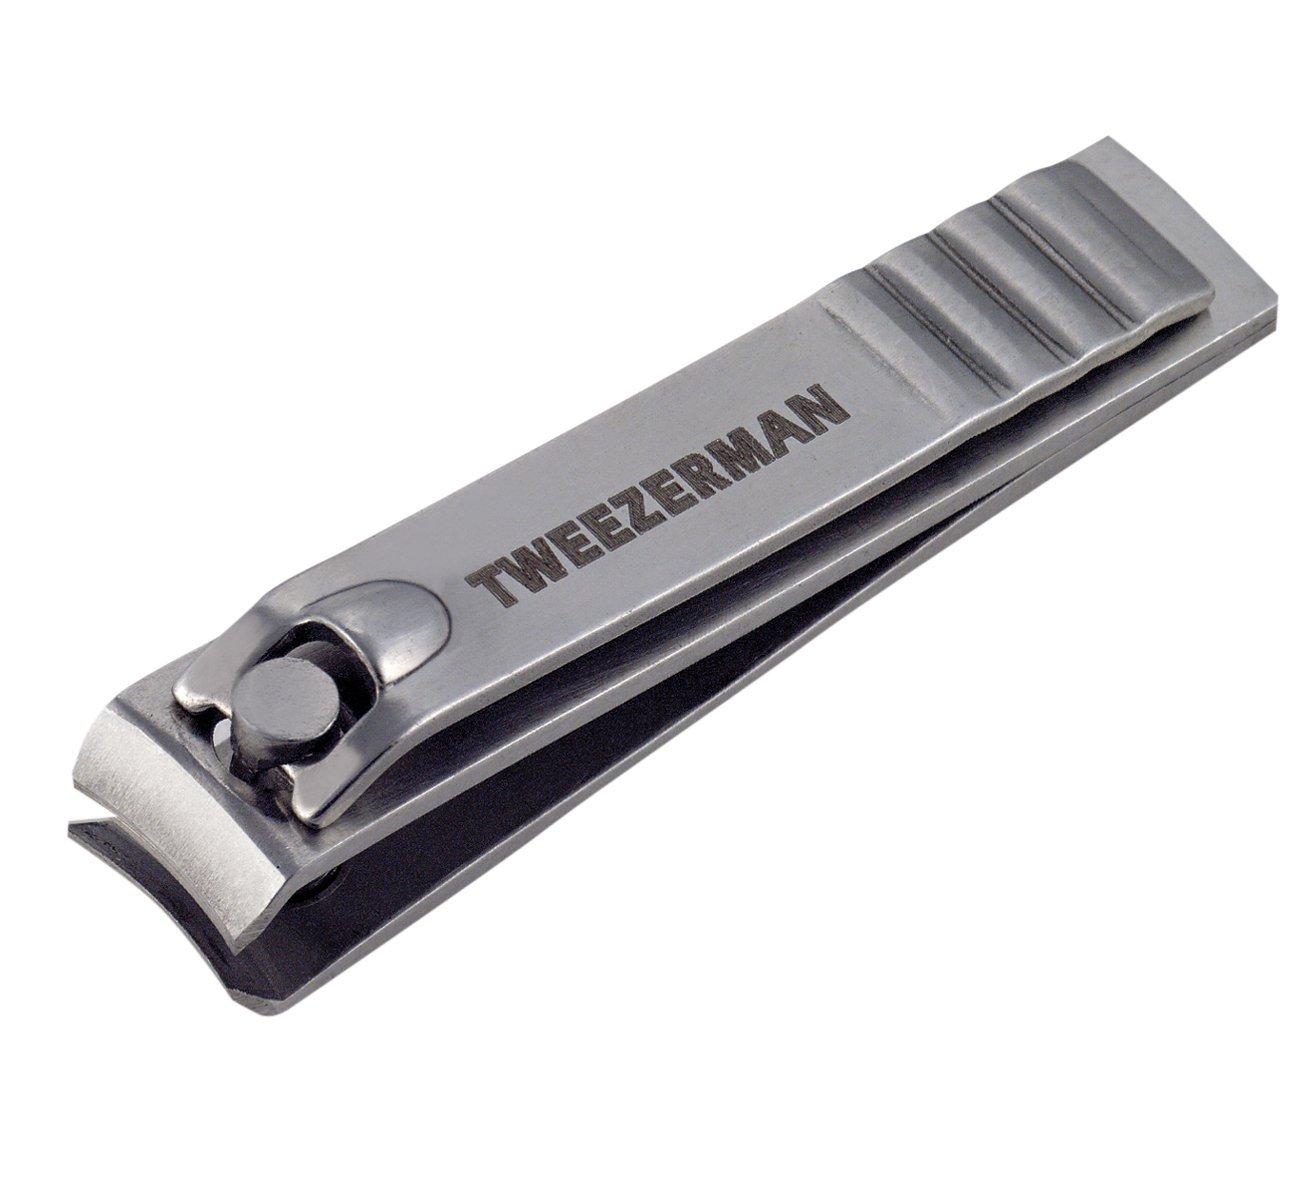 Tweezerman Fingernail Clipper, Stainless Steel 3013-P 6L-84HP-YFTM